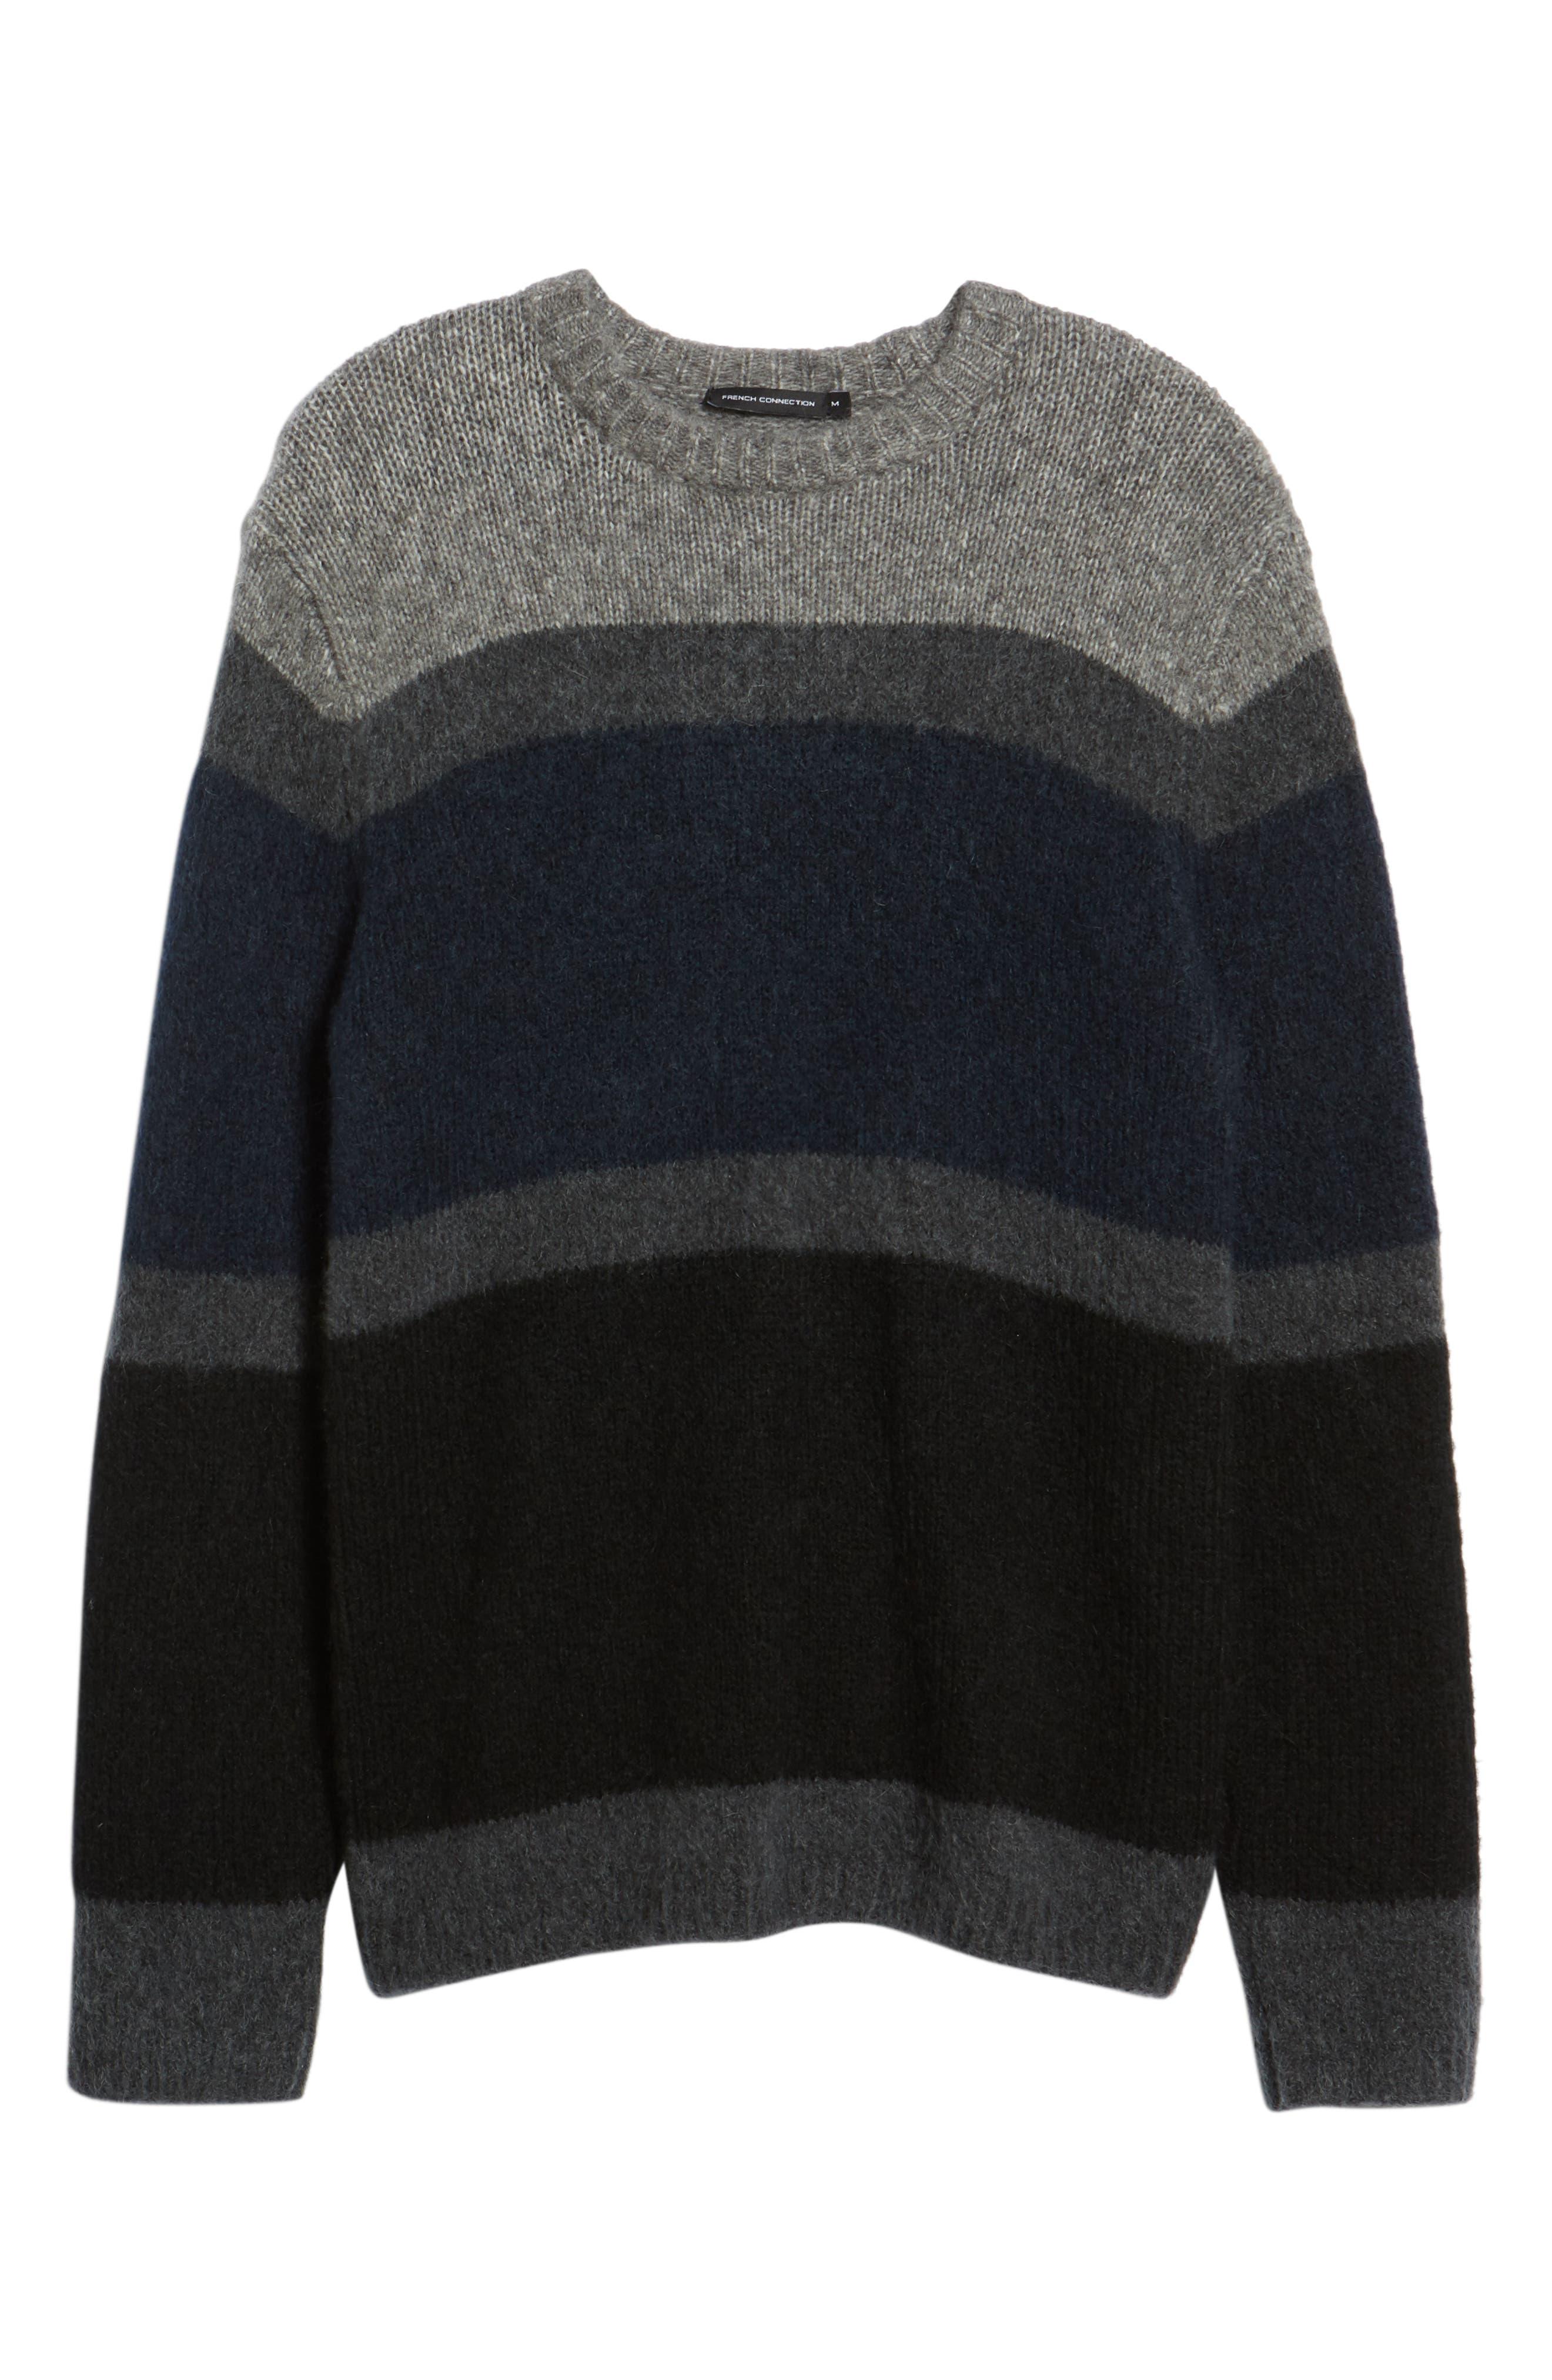 Stripe Sweater,                             Alternate thumbnail 6, color,                             UTILITY BLUE CHARCOAL MELANGE